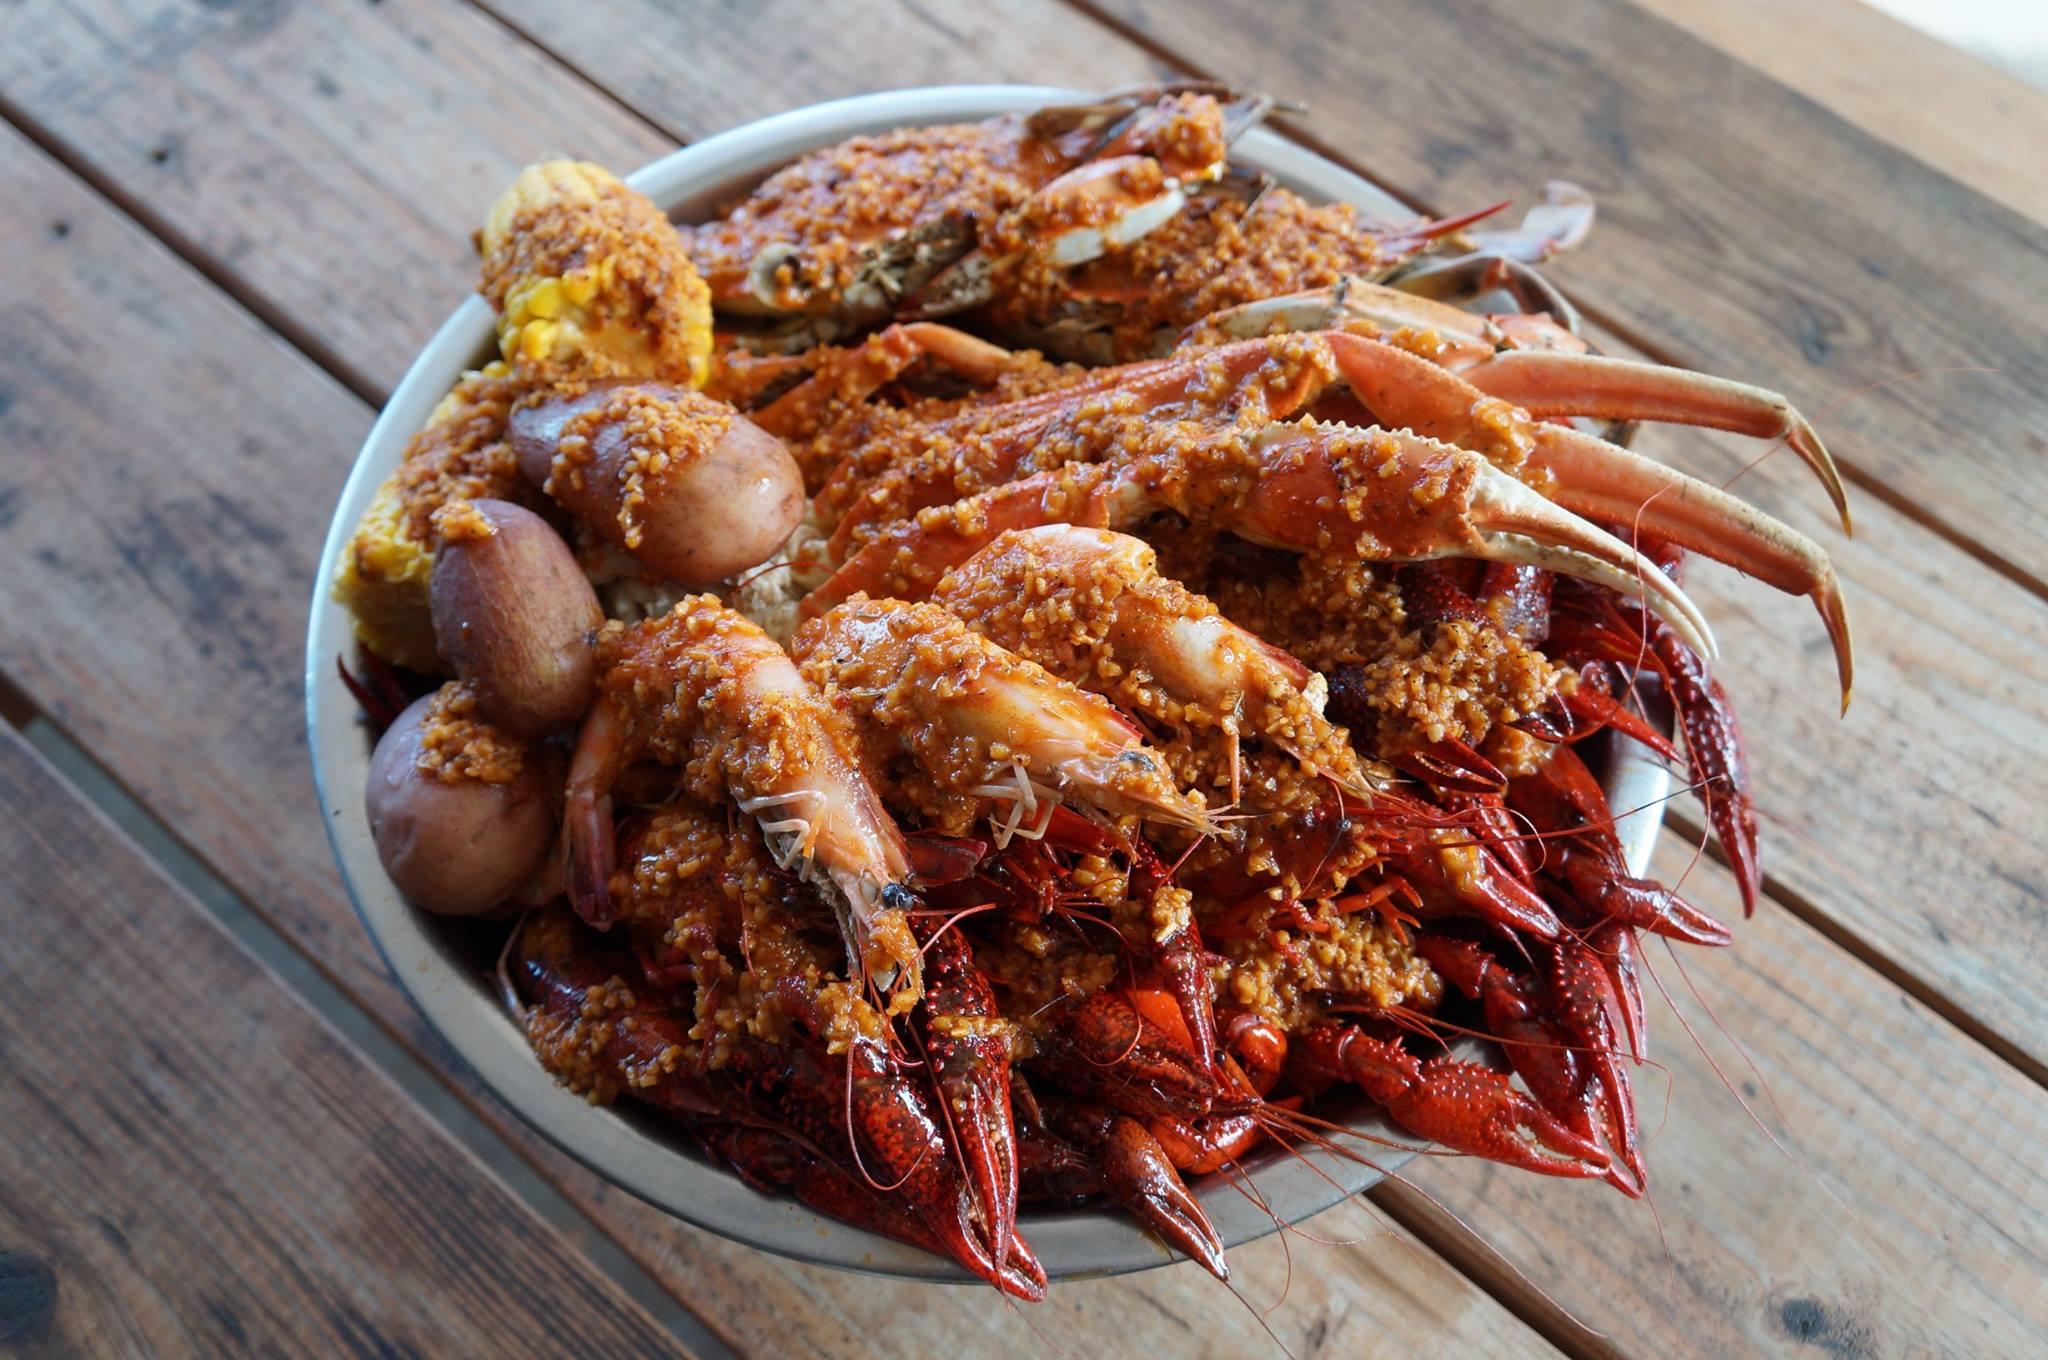 The Best Crawfish Restaurants In Houston 10 Spots That Do